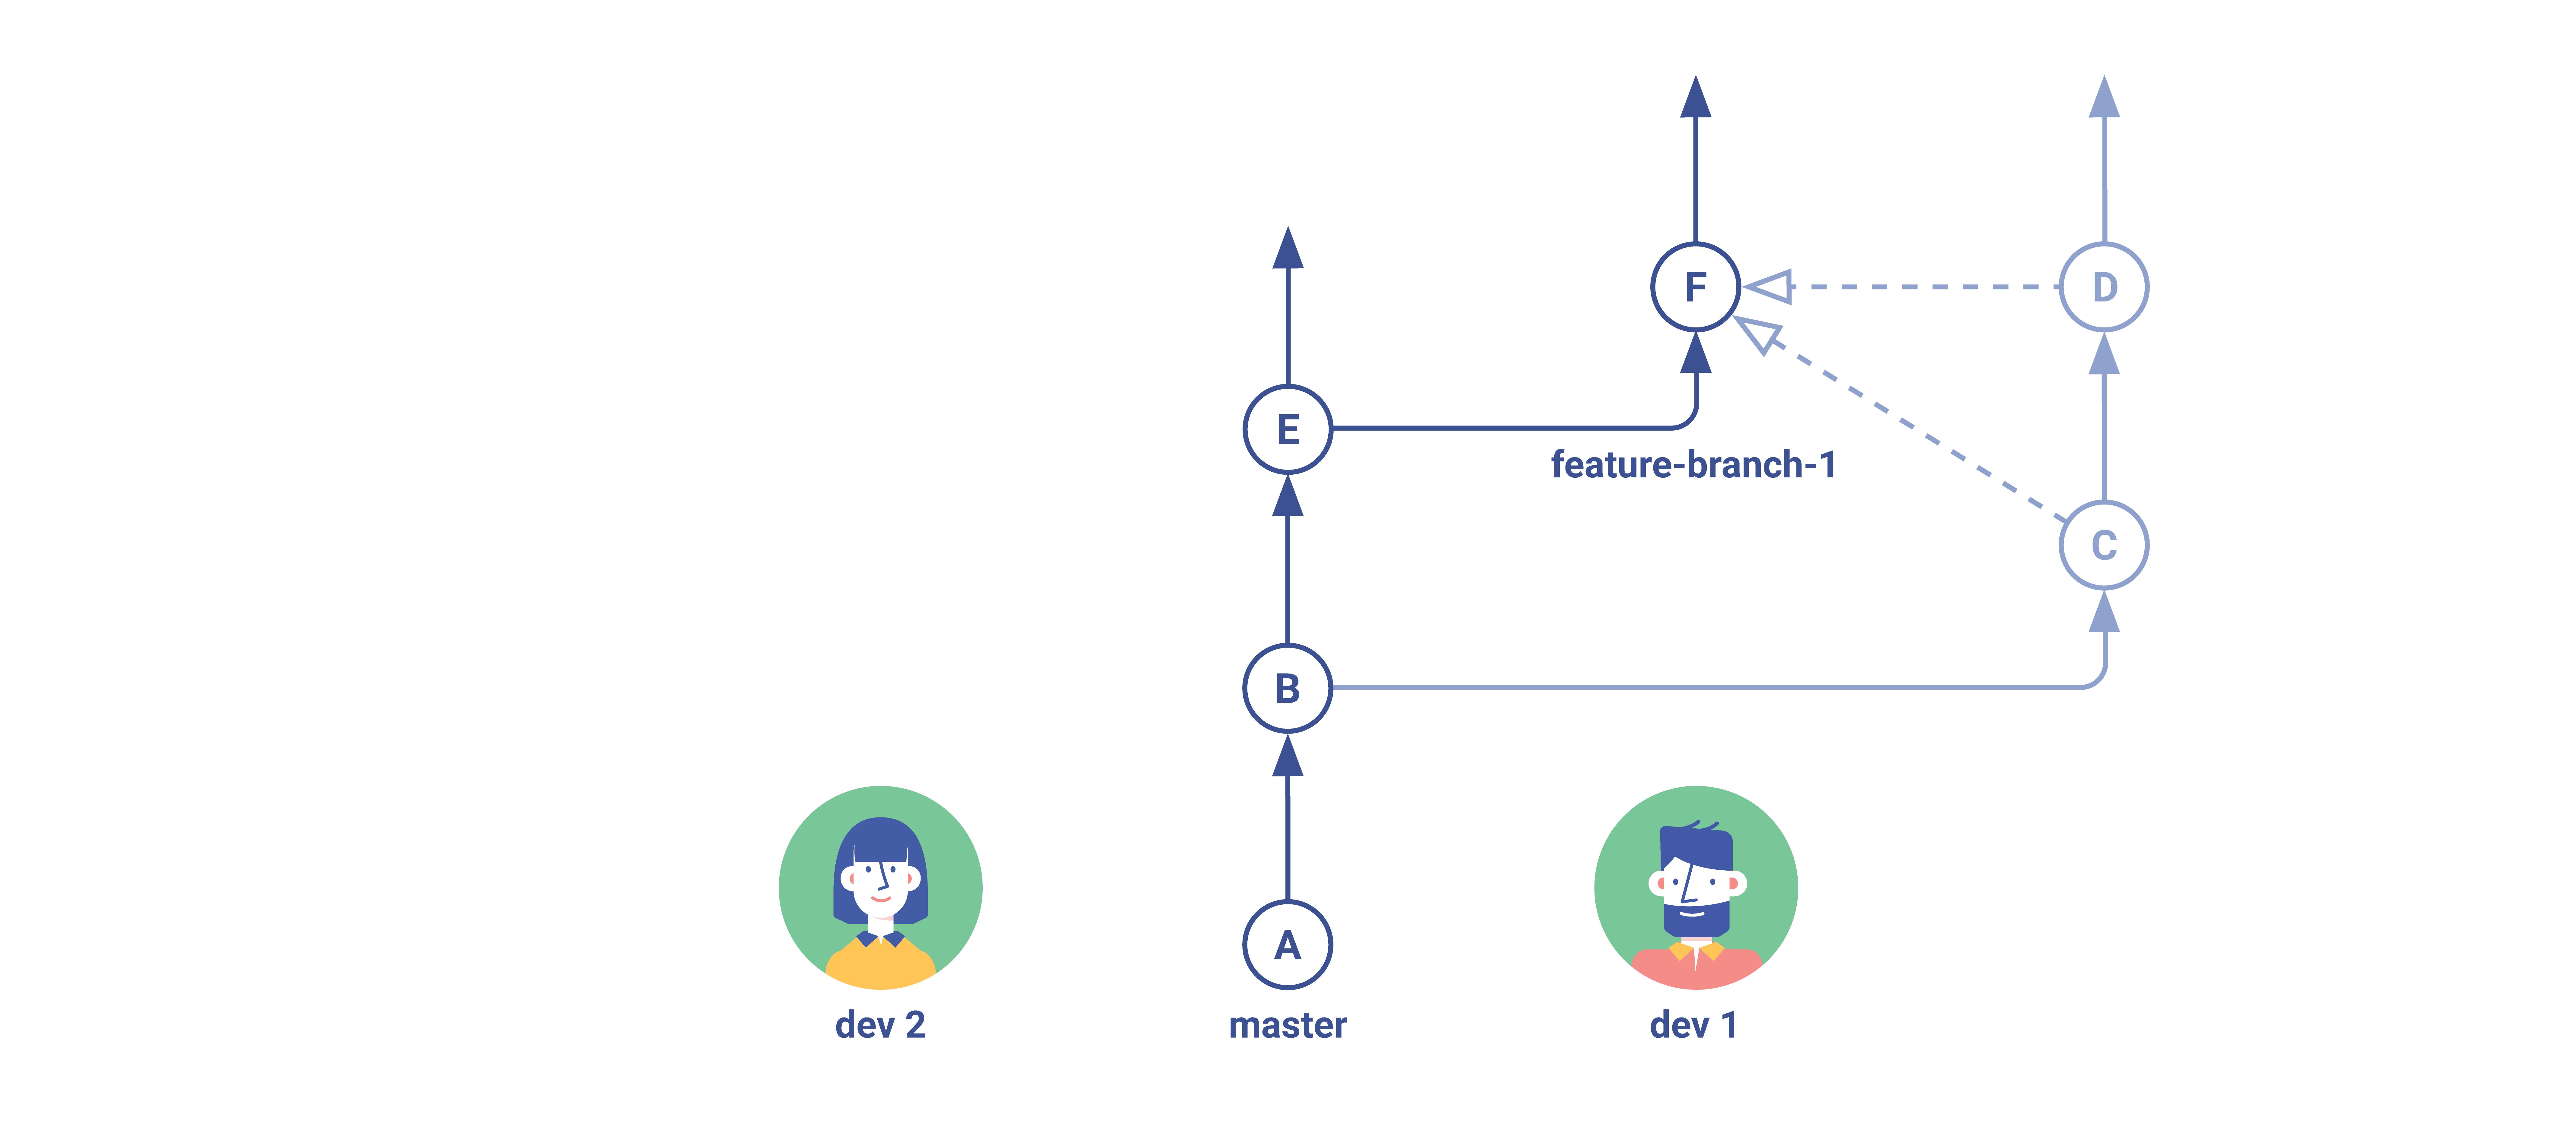 Gitflow Squash Step 3